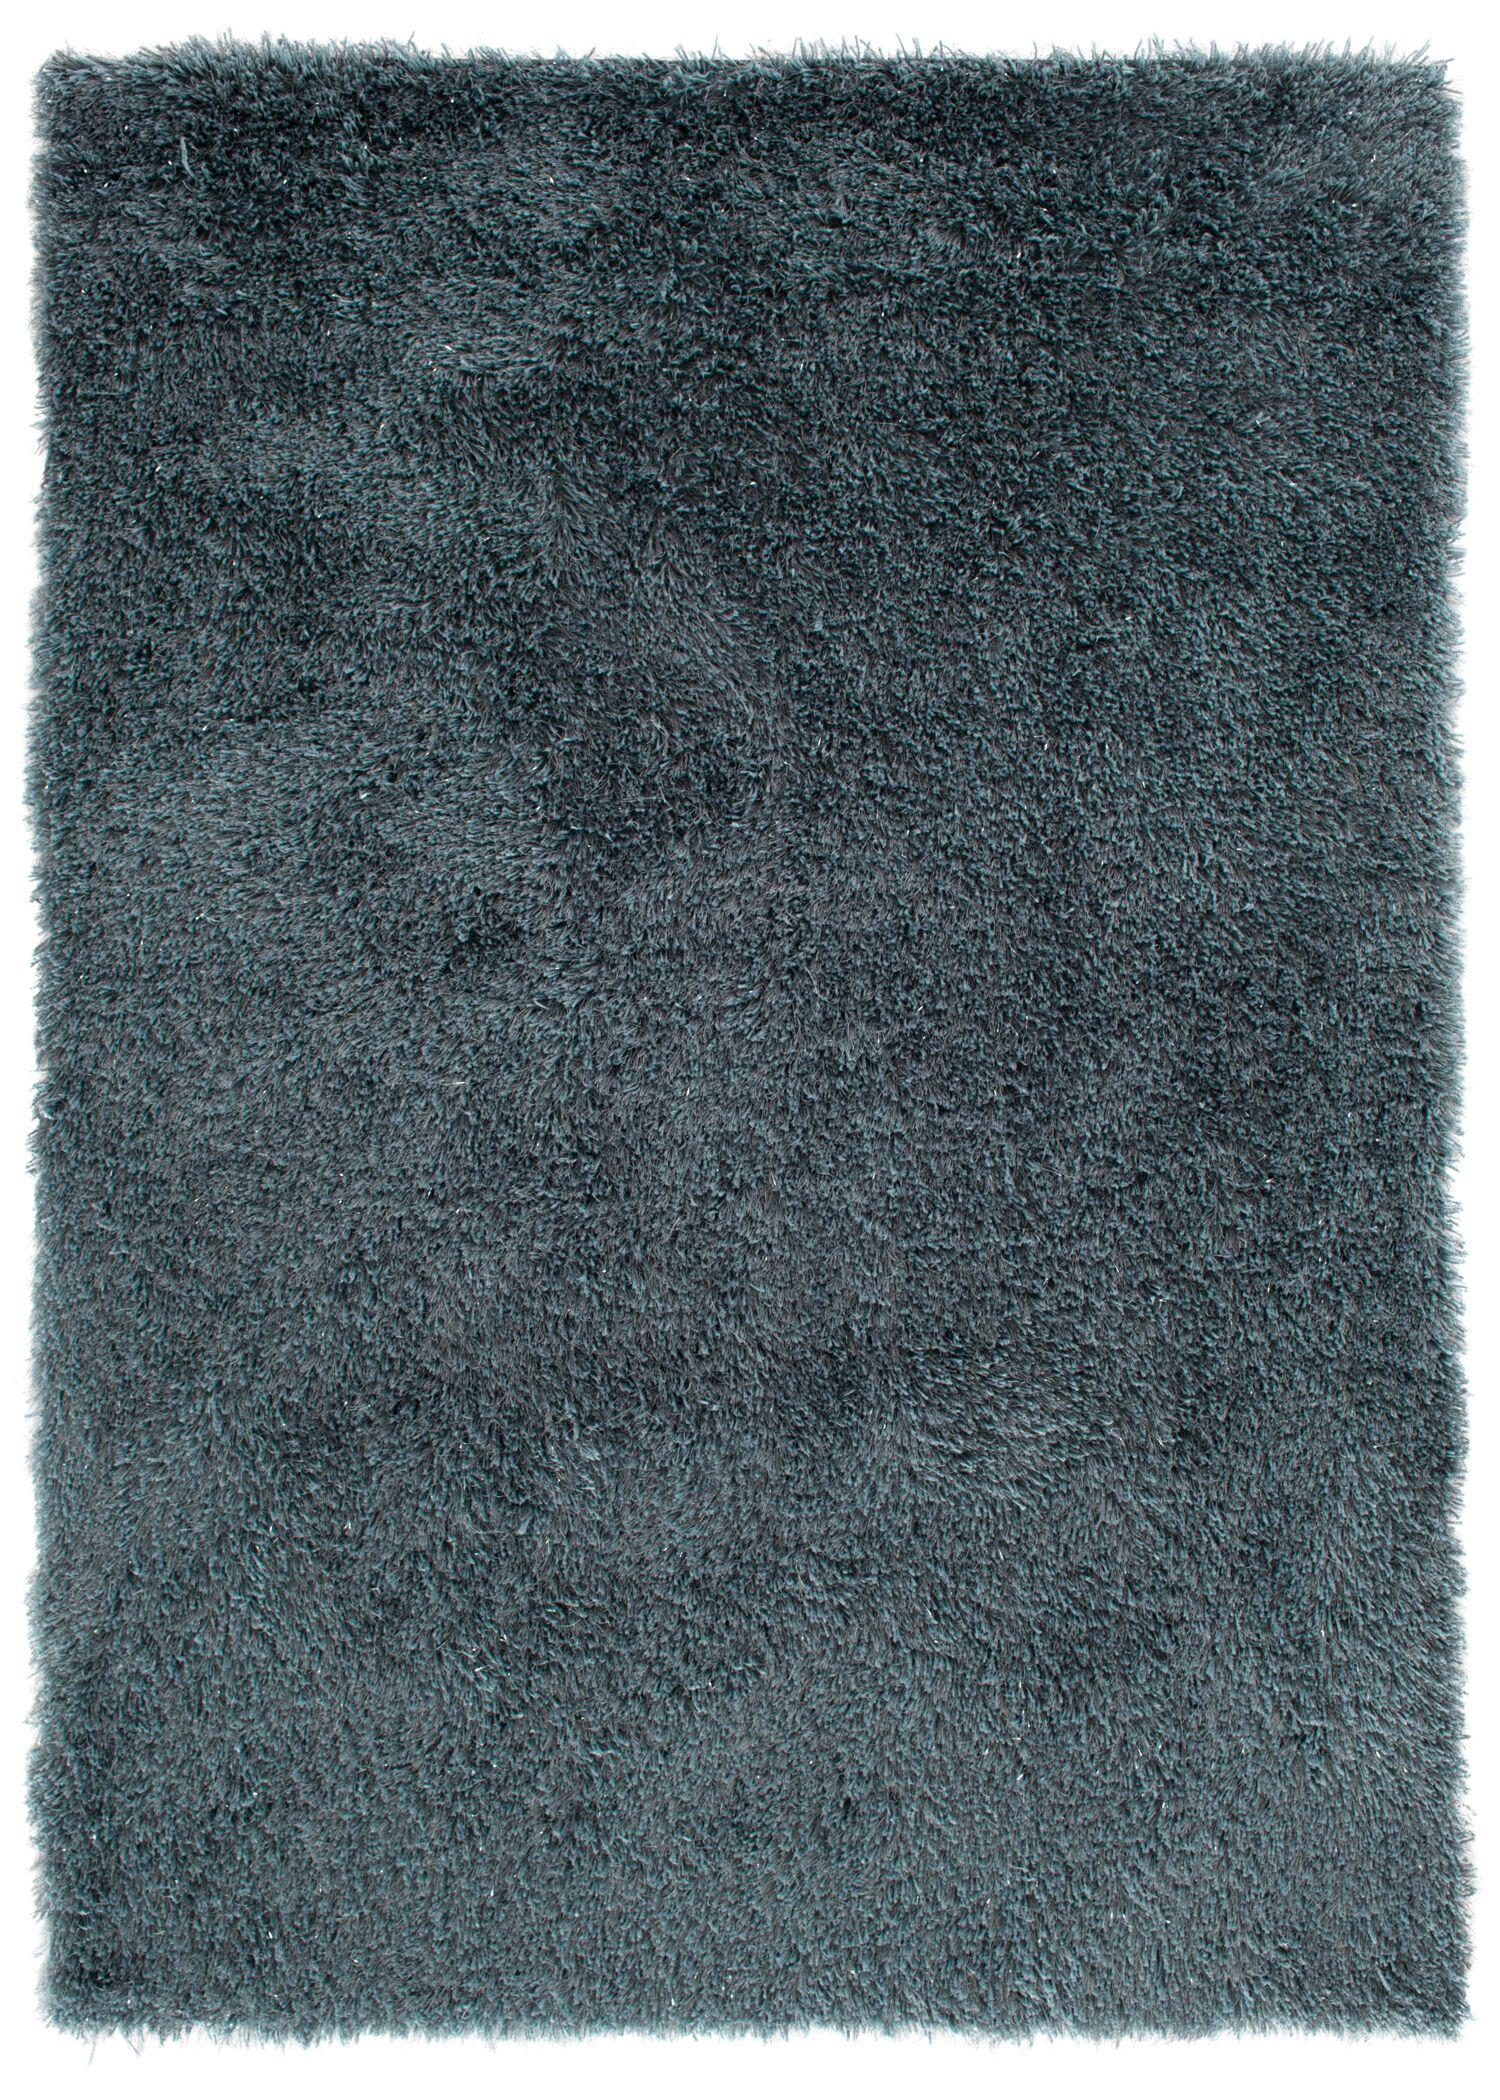 Ramhit Shag Blue Area Rug Rug Size: Rectangle 5' x 7'